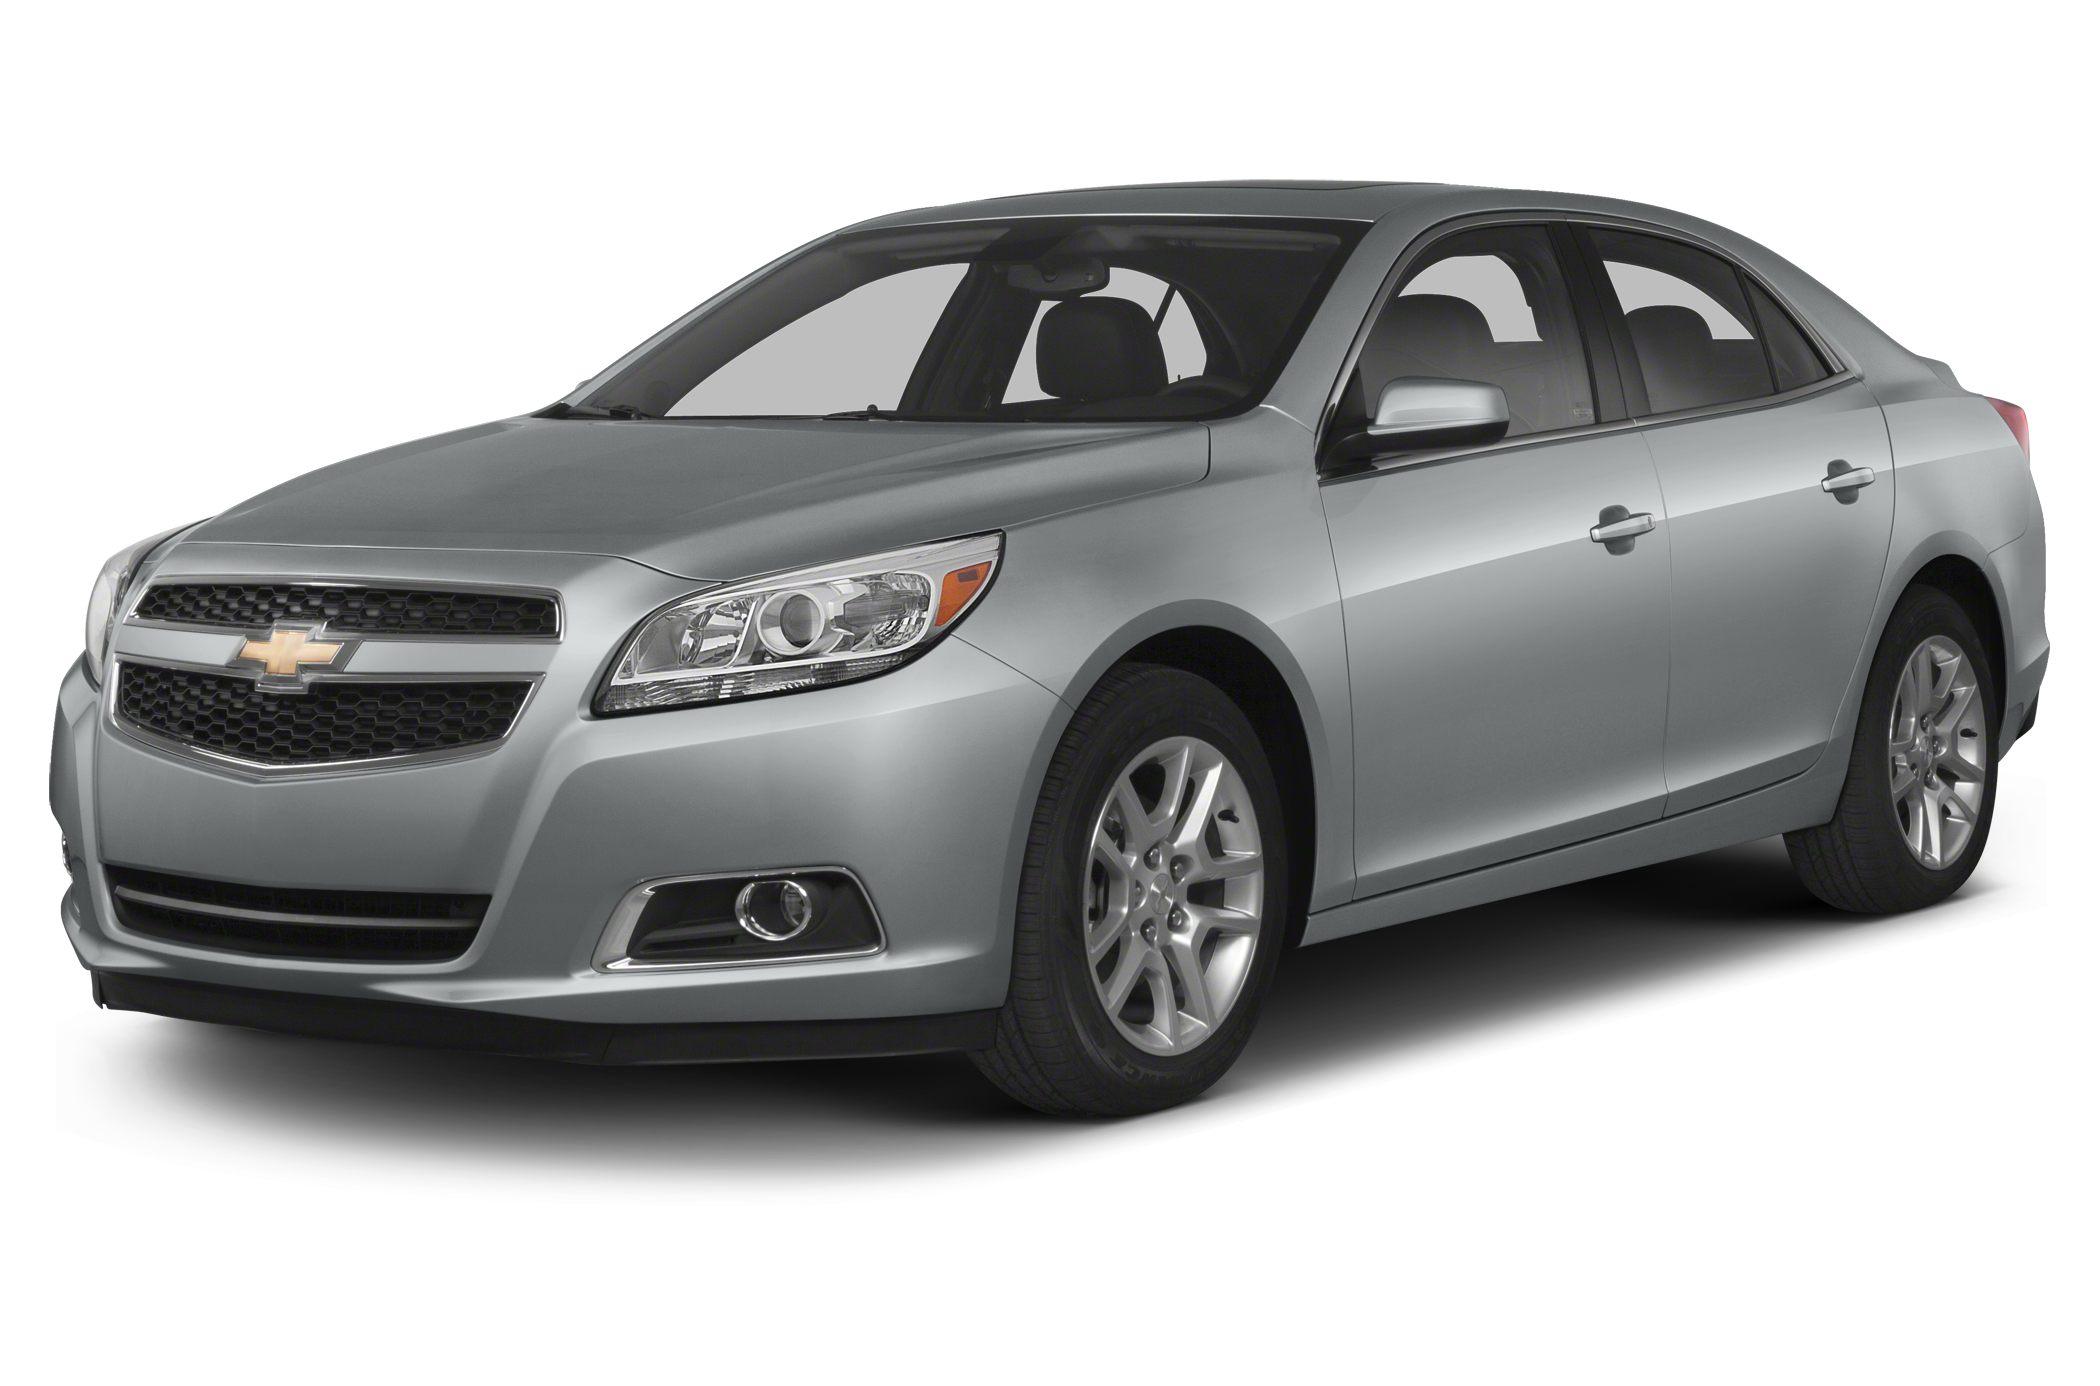 2013 Chevrolet Malibu New Car Test Drive